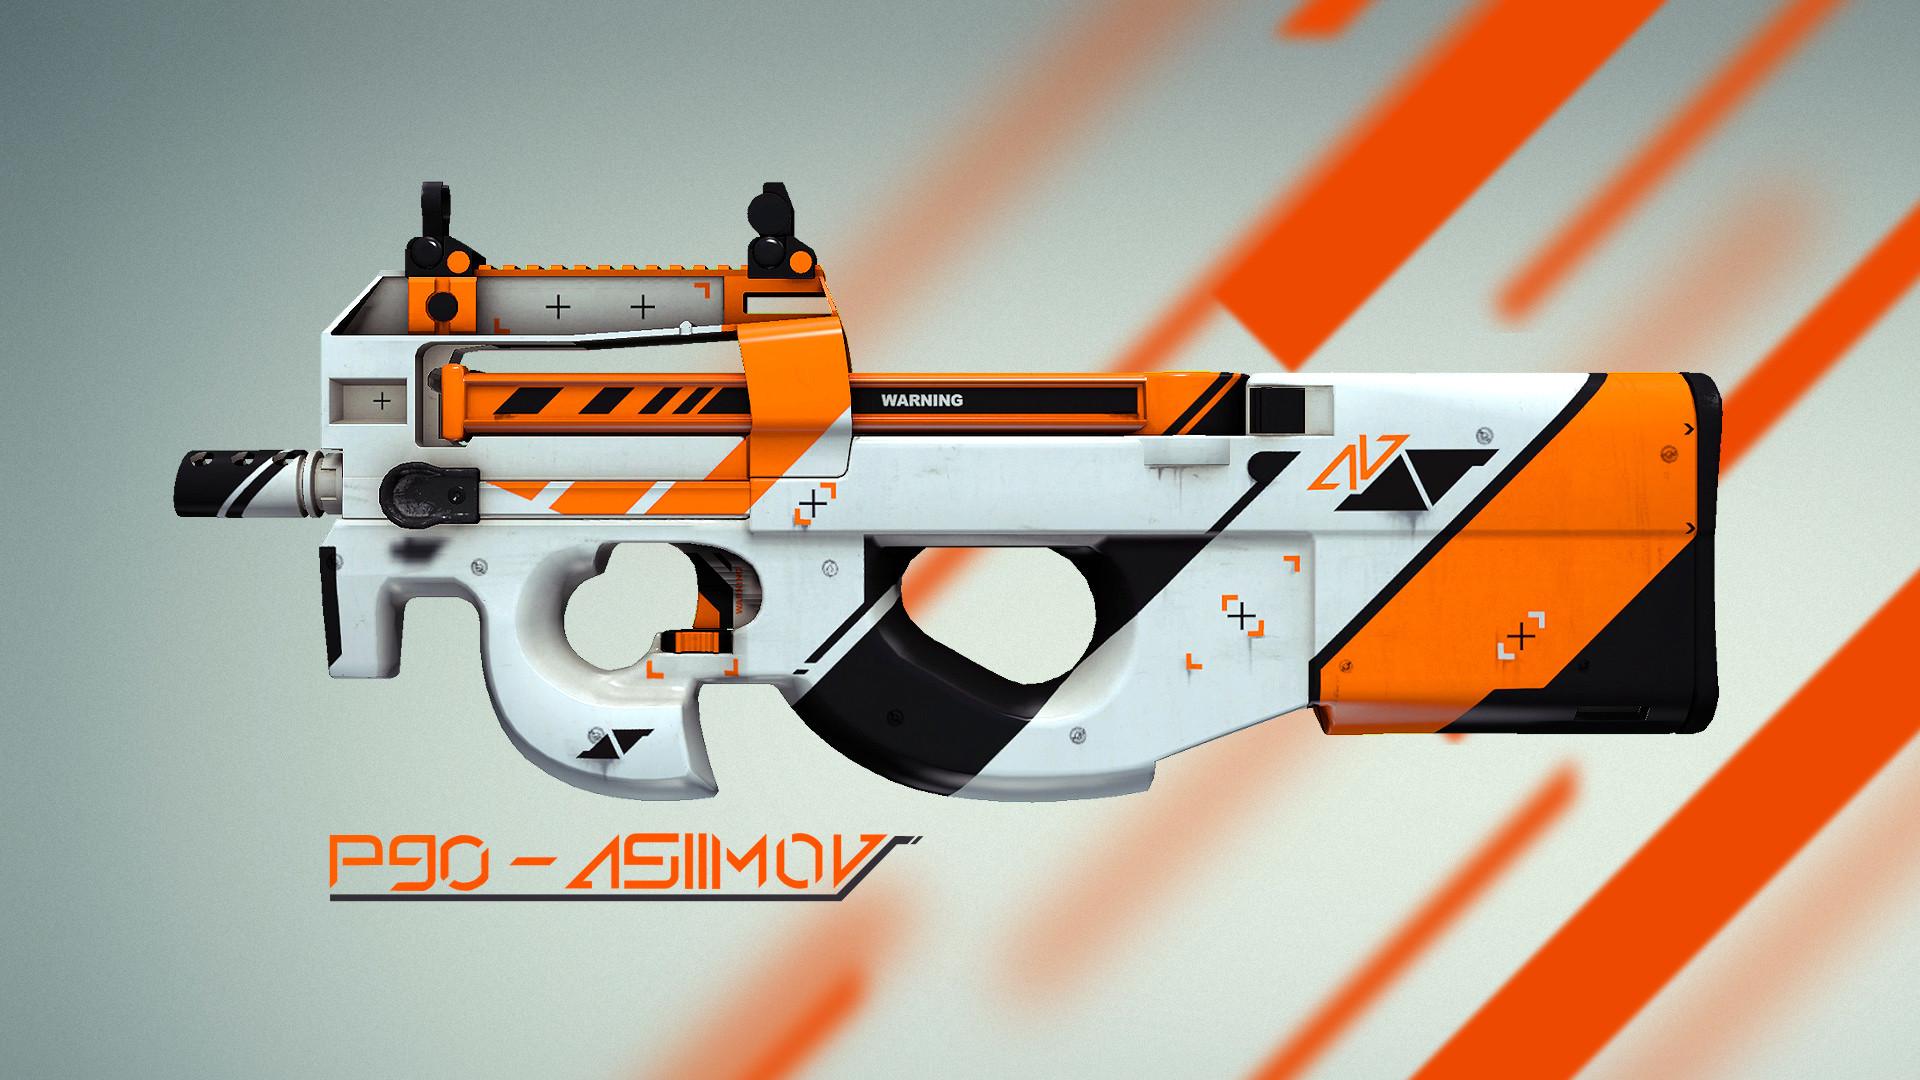 P90, asiimov, cs:go, counter strike, global offensive, skin wallpapers